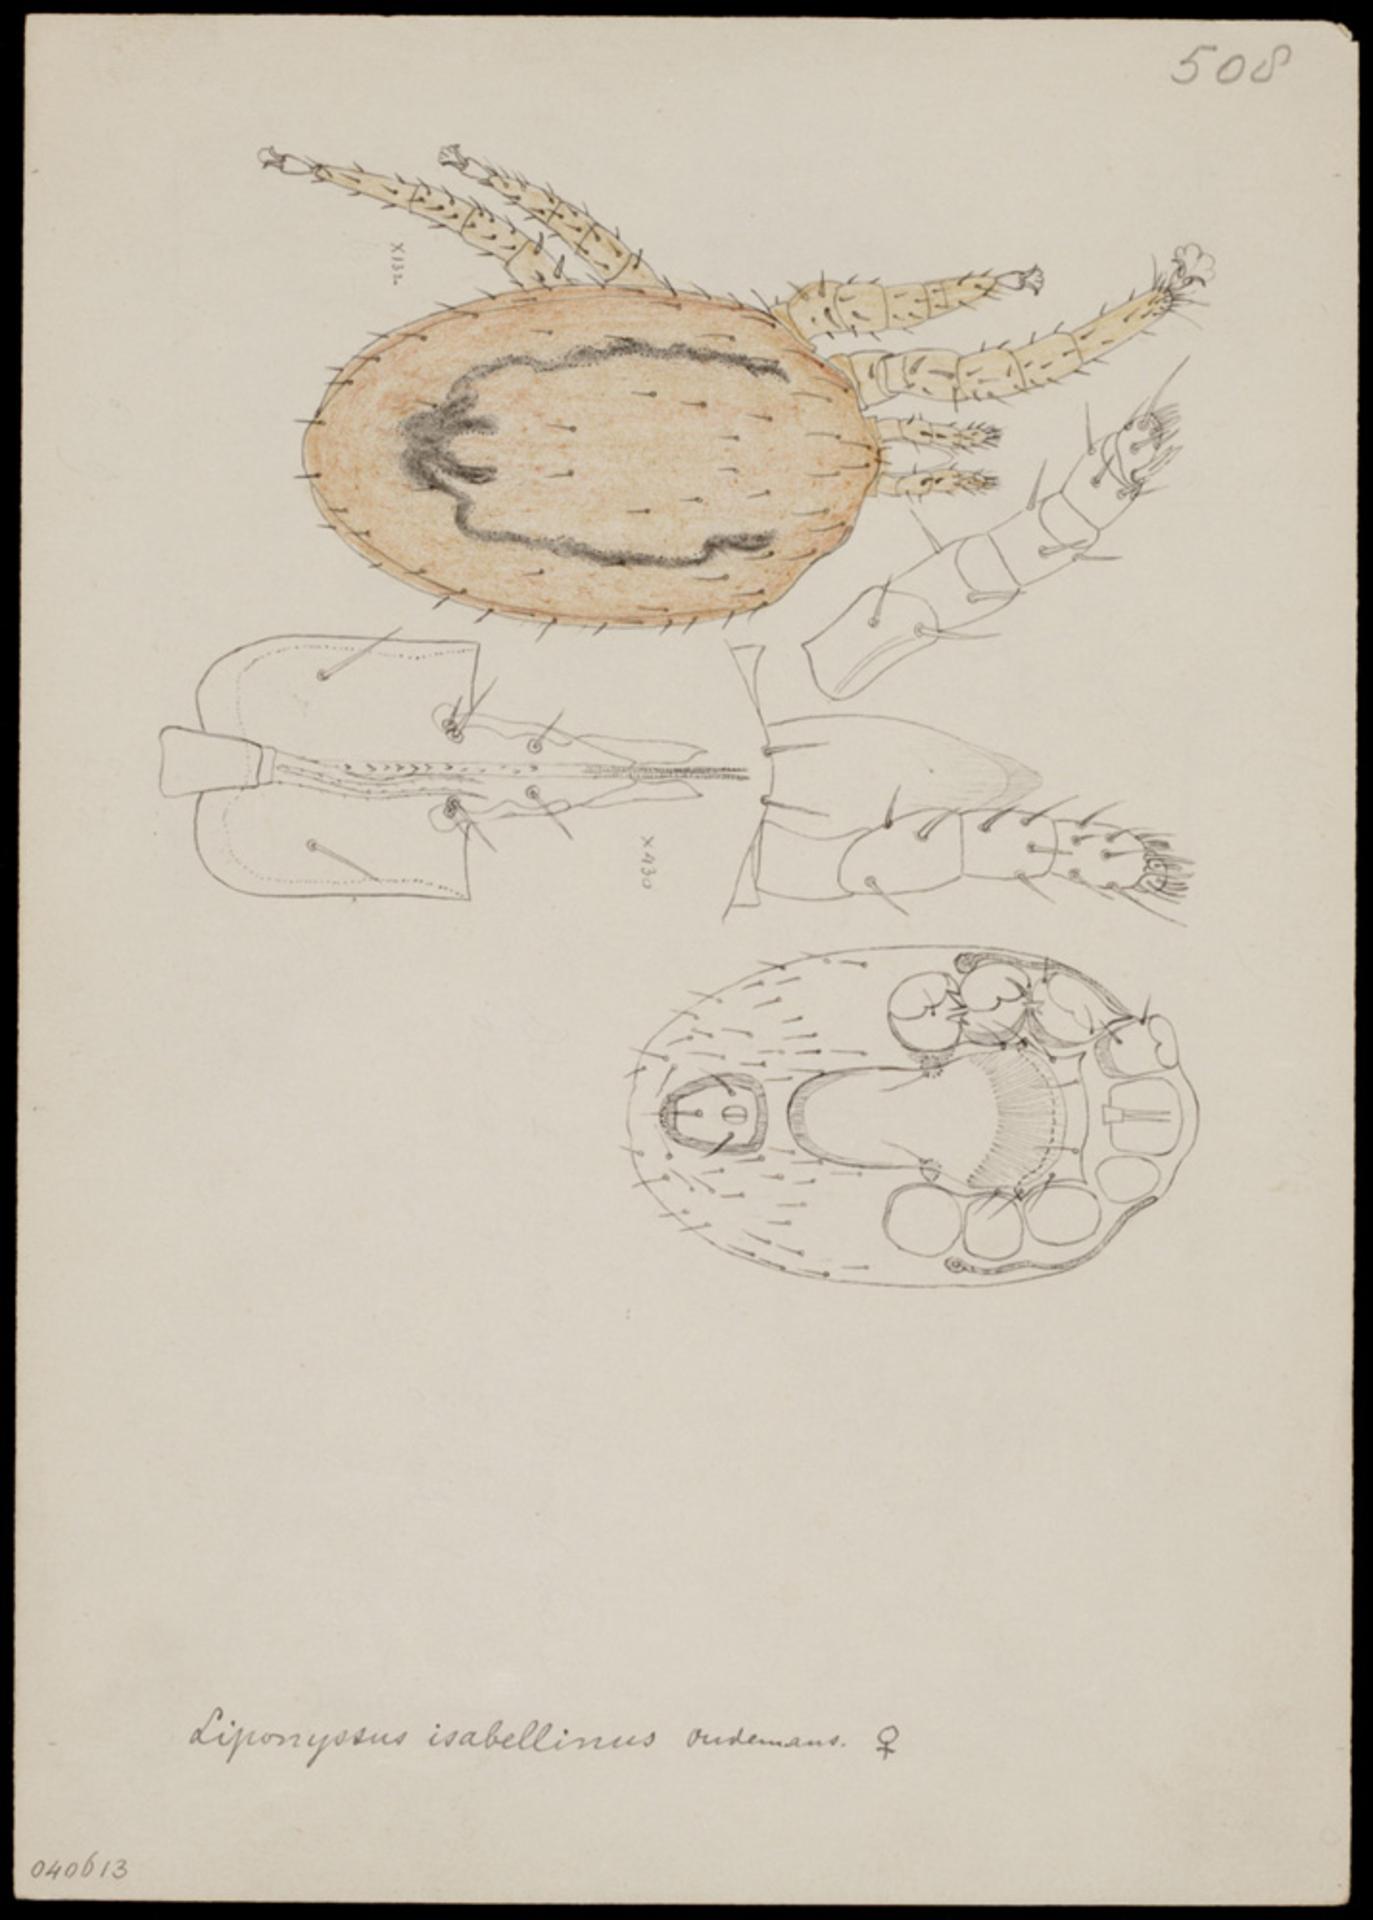 RMNH.ART.1245 | Liponyssus isabellinus (Oudemans)